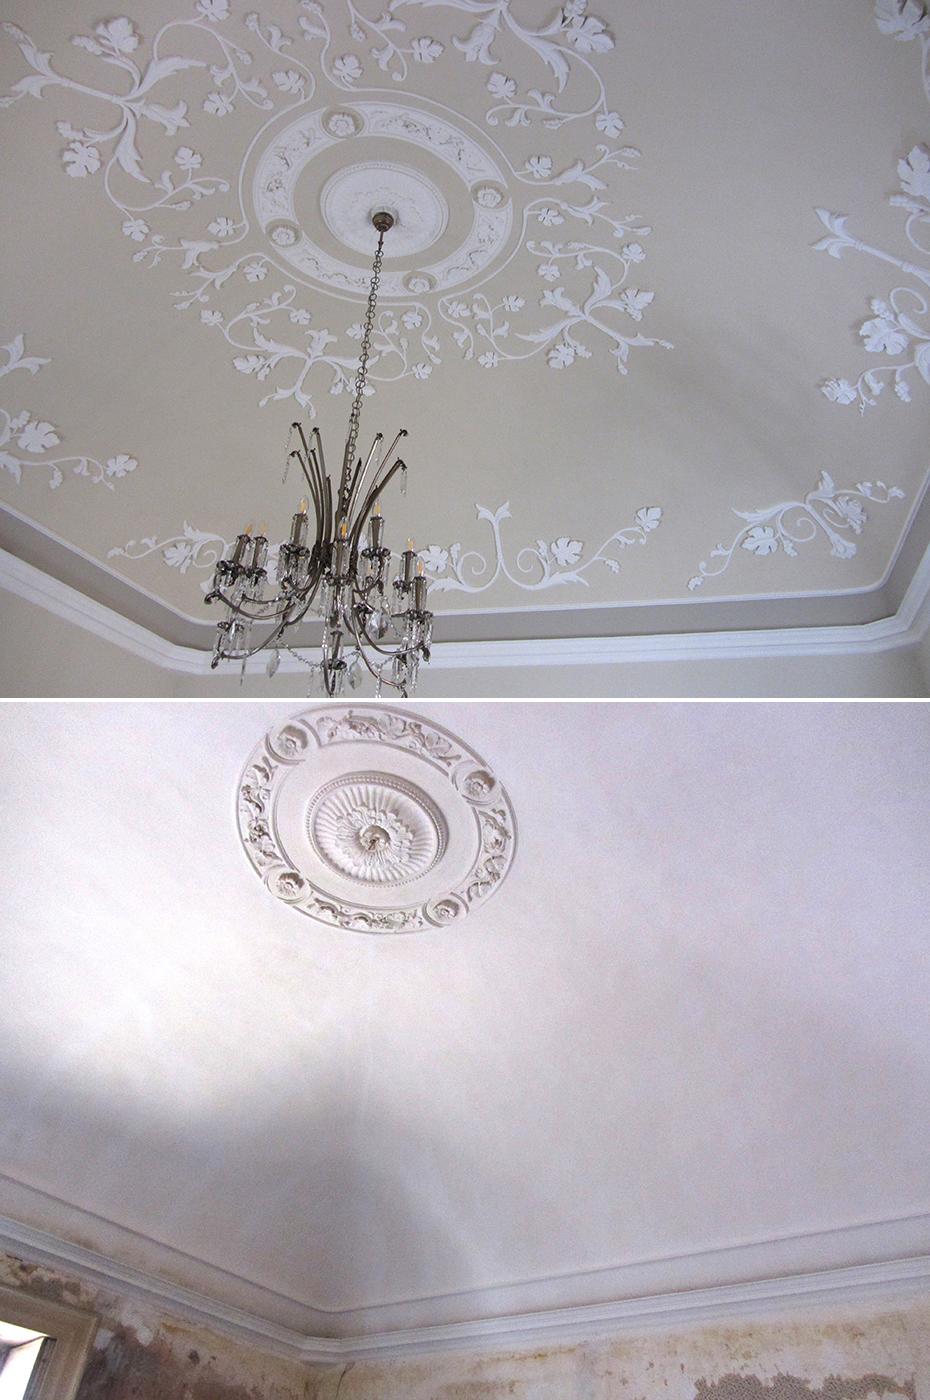 Stucchi decorativi decorazione di interni progettazione - Decorazione di interni ...